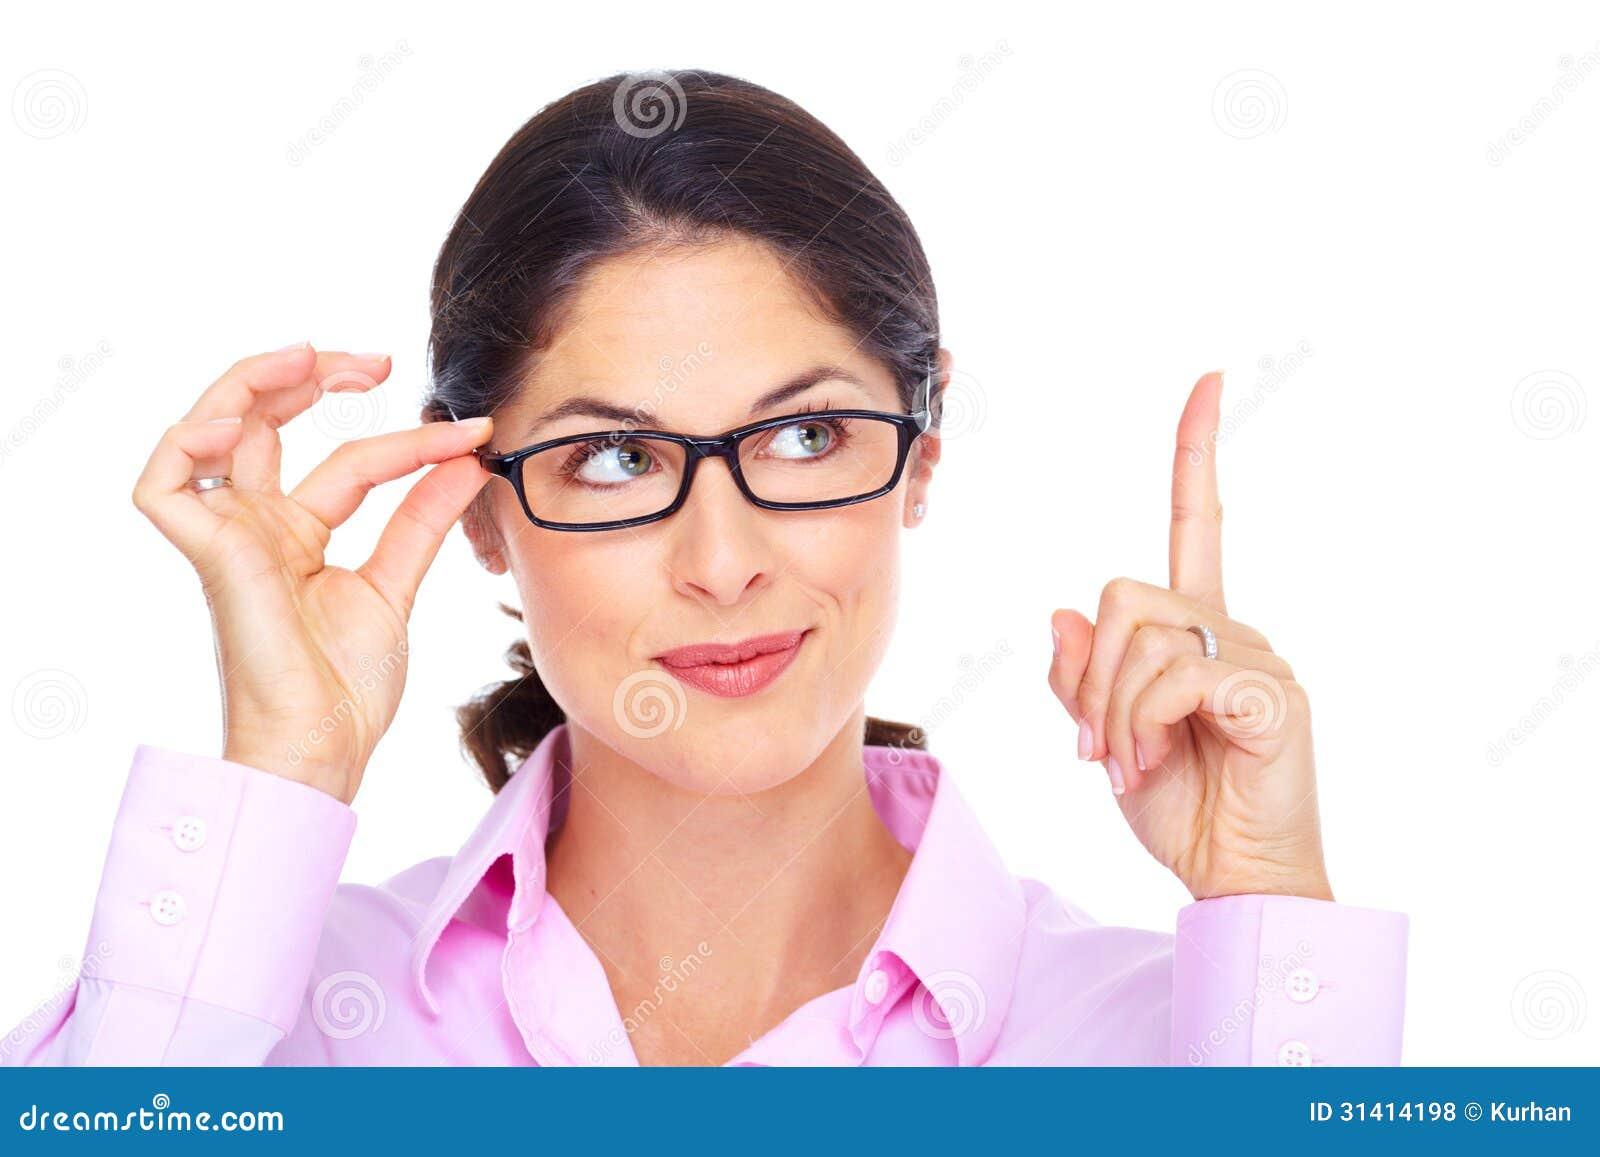 trendy reading glasses 6773  trendy reading glasses